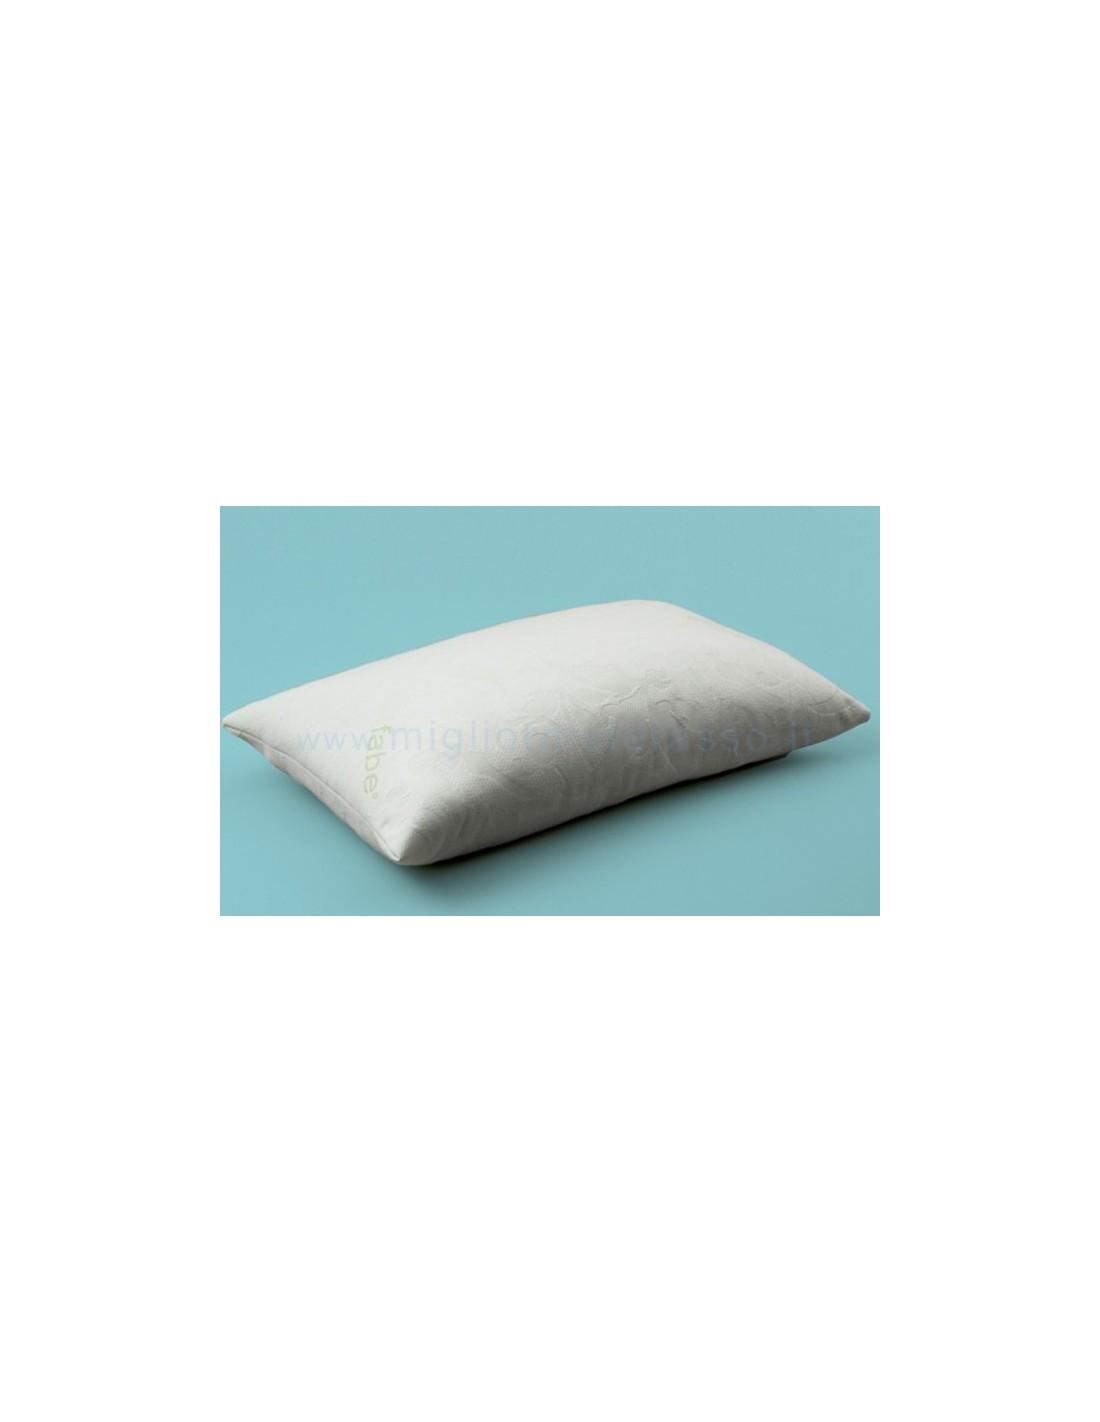 Federa Cuscino Antiacaro.Copricuscino Antiacaro Cotone Jersey Per Tutti I Cuscini